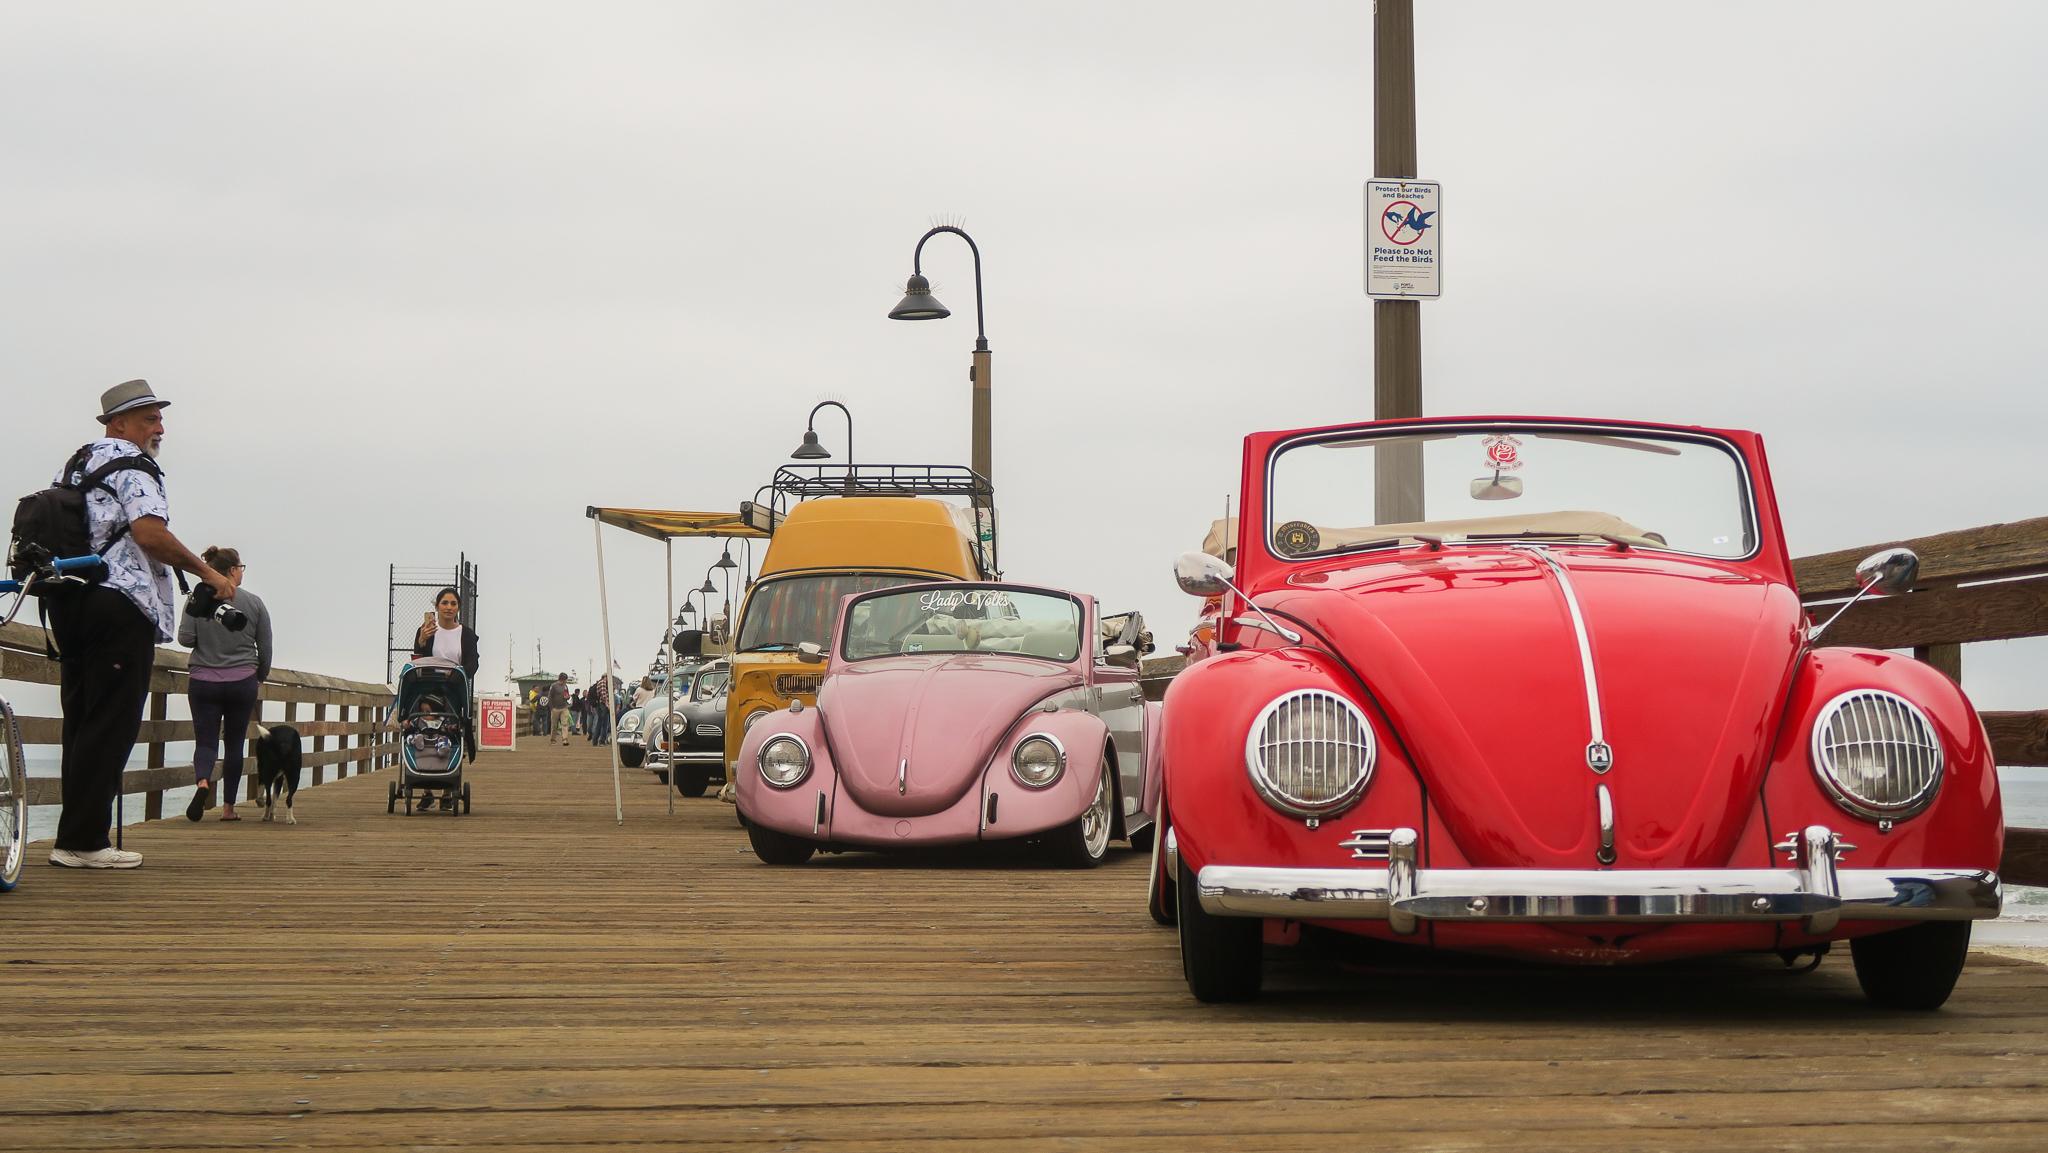 Fiesta En La Playa San Diego Air Cooled Driving Purity - San diego classic car show 2018